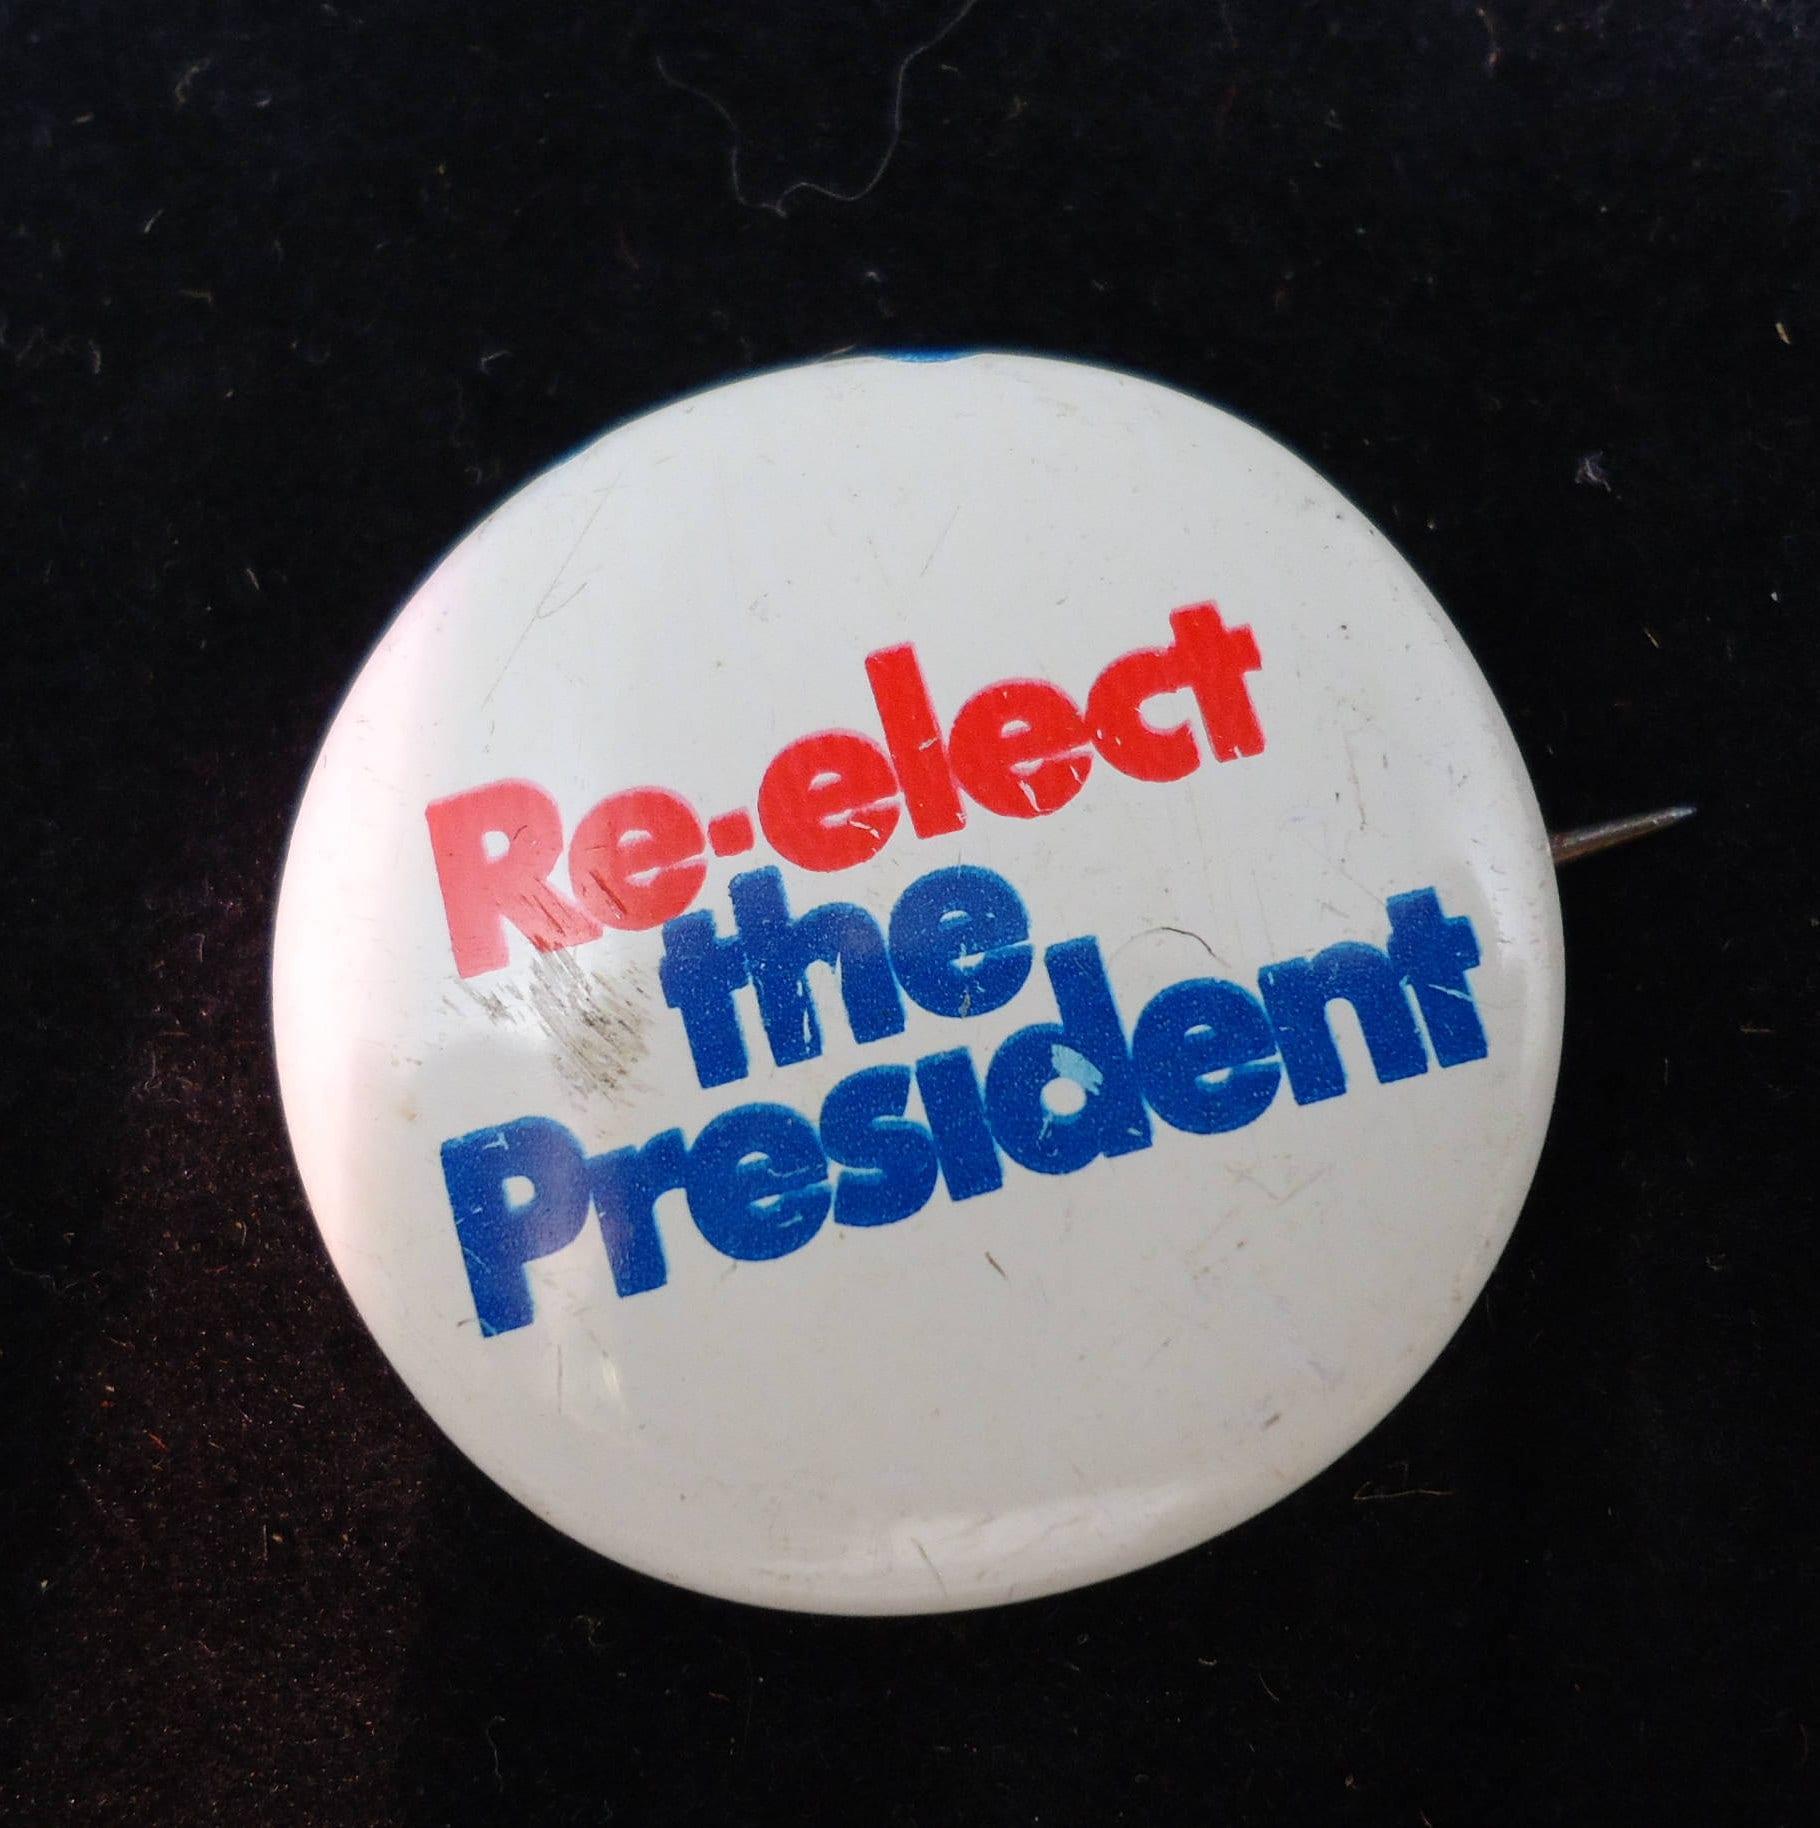 Rare Nixon Pins: Vintage Political Campaign Buttons Nixon Collectibles Red